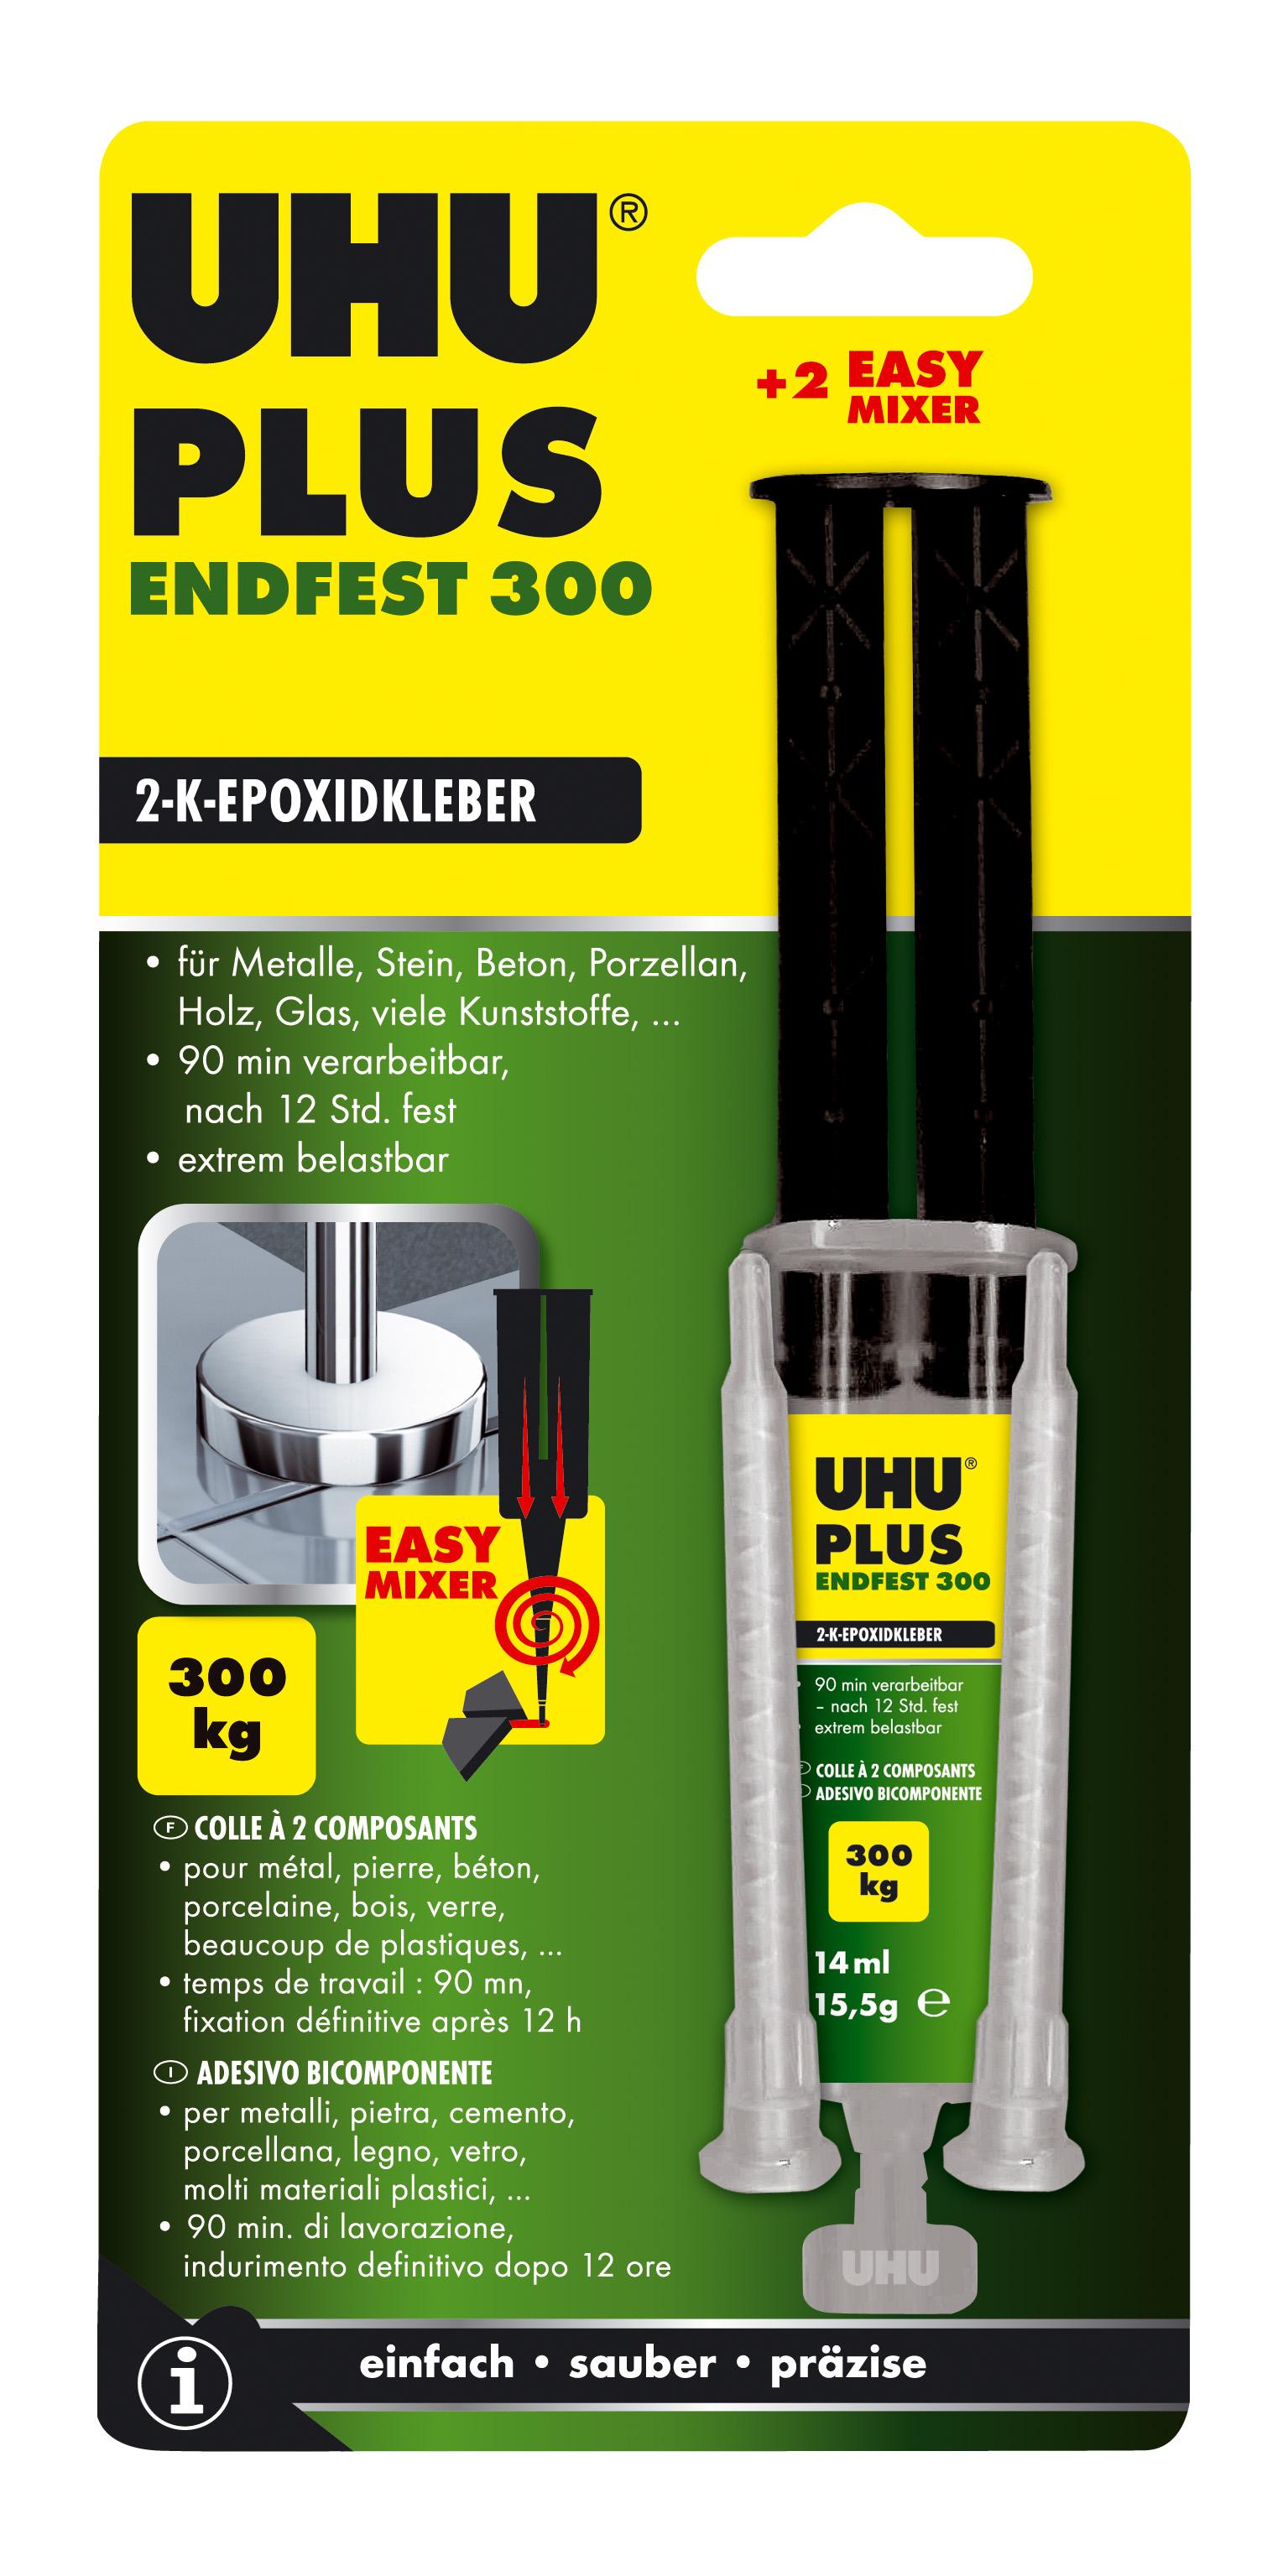 UHU plus endfest 2-Komponenten-Epoxidharzkleber Doppelkammerspritze inkl. stat. Mischer 15g Infokart